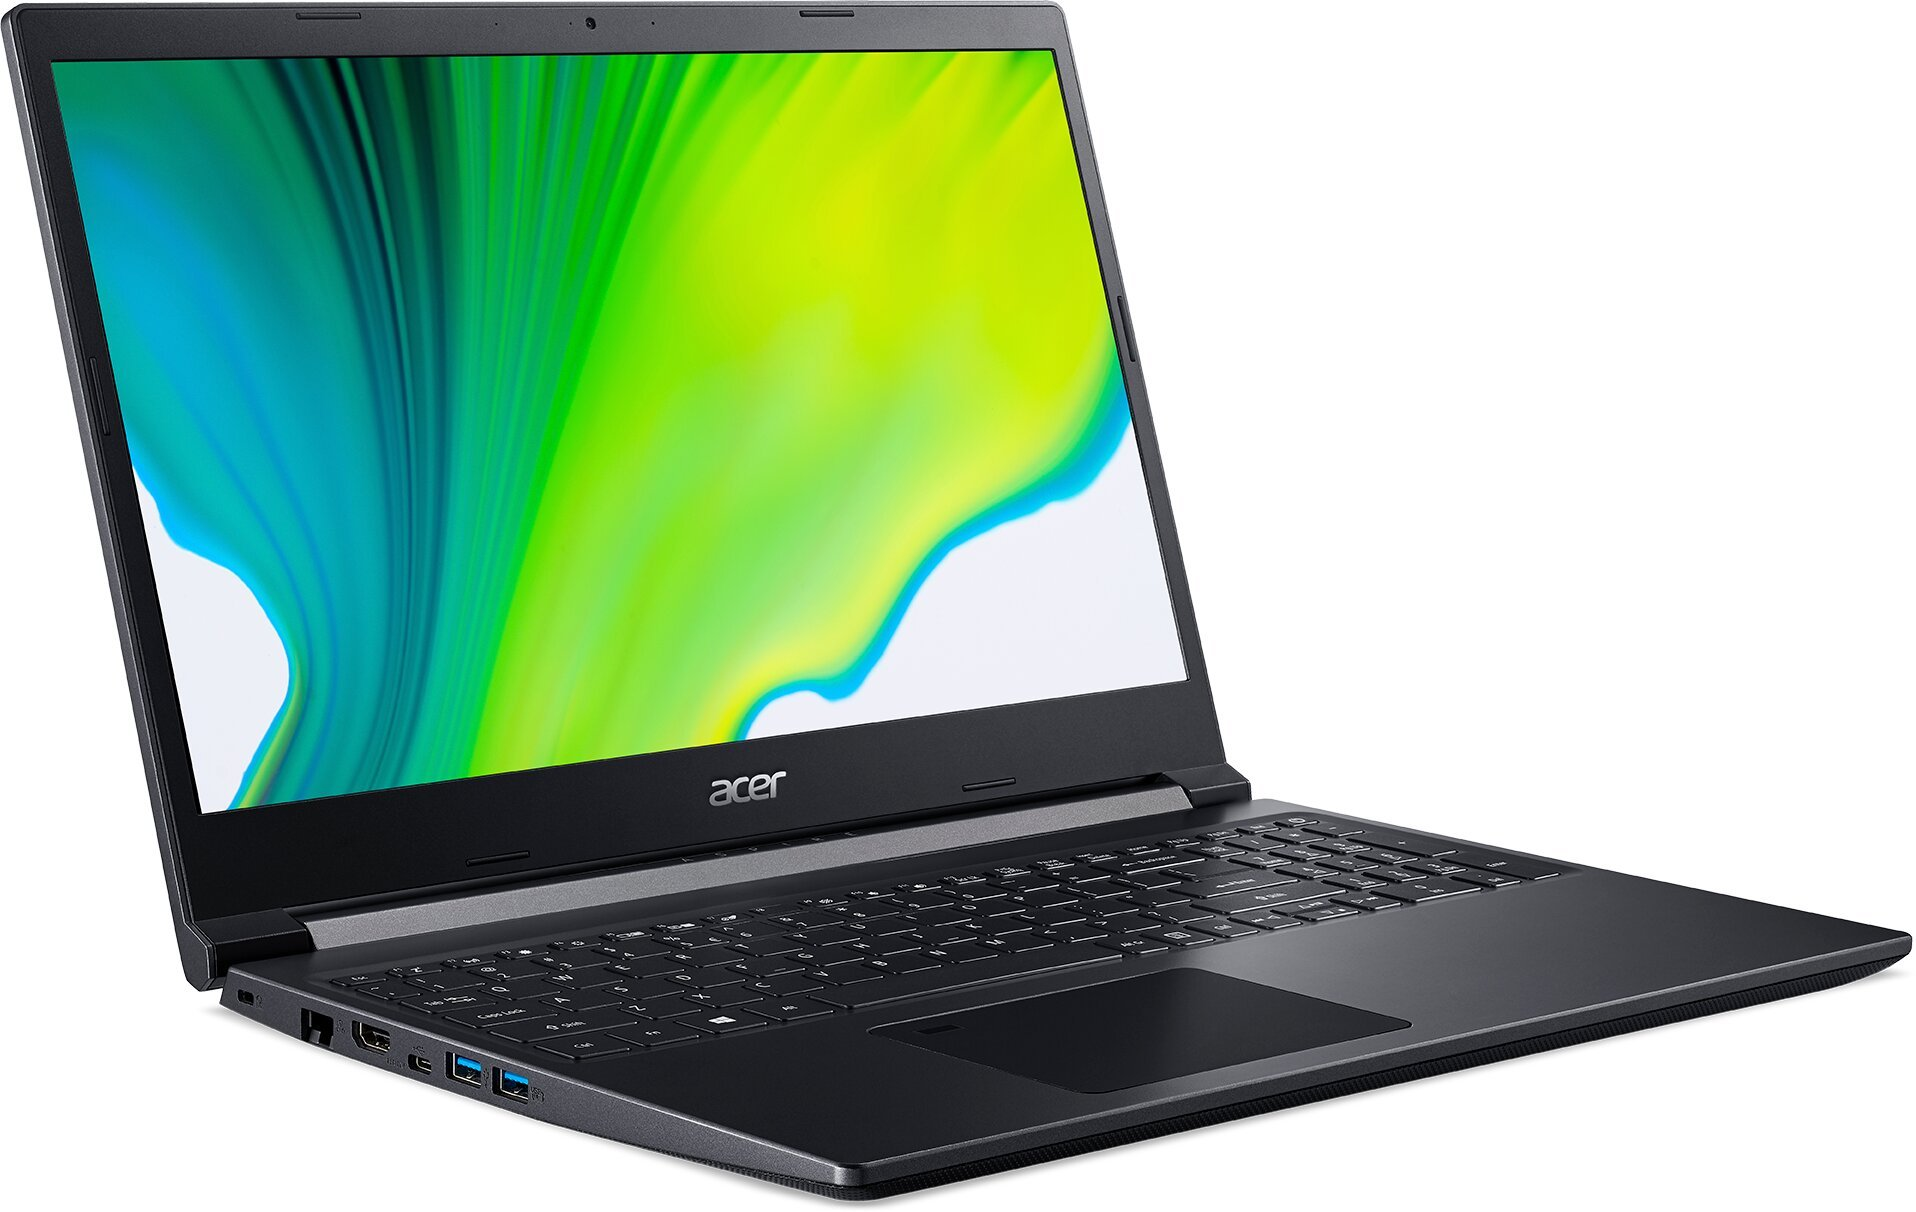 Acer Aspire 7 A715-75G-79JL